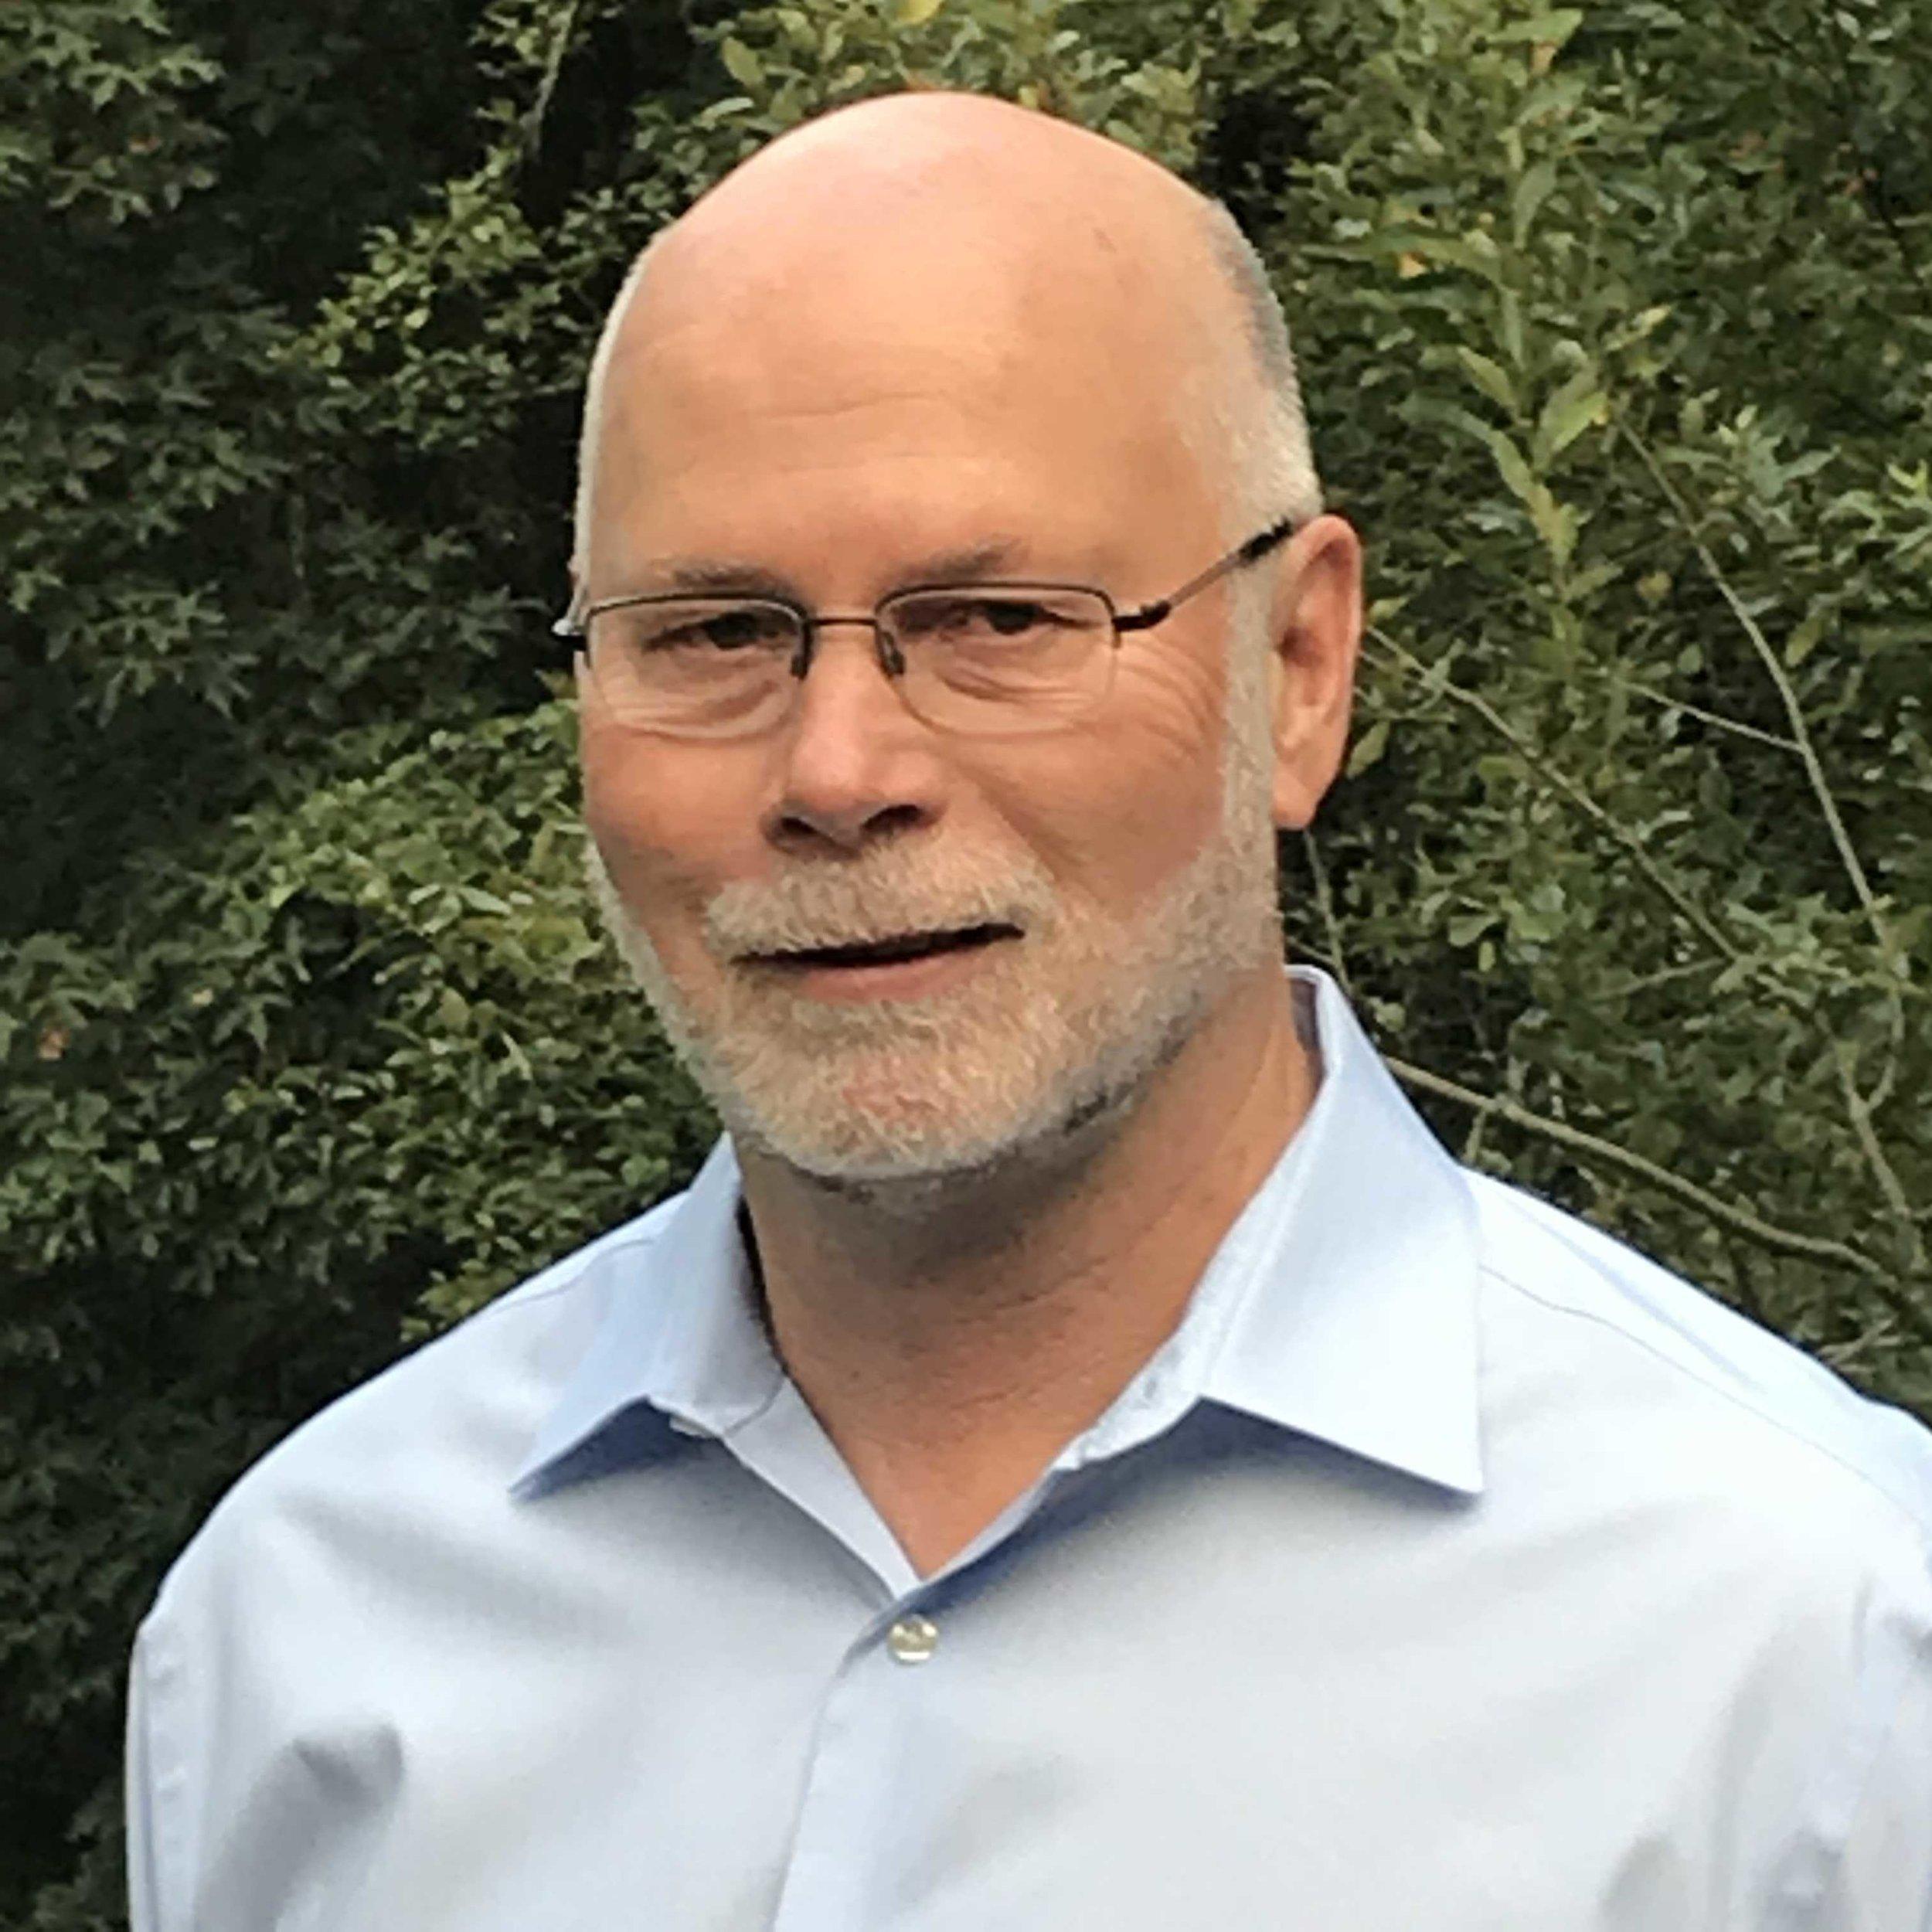 Roger Cummings